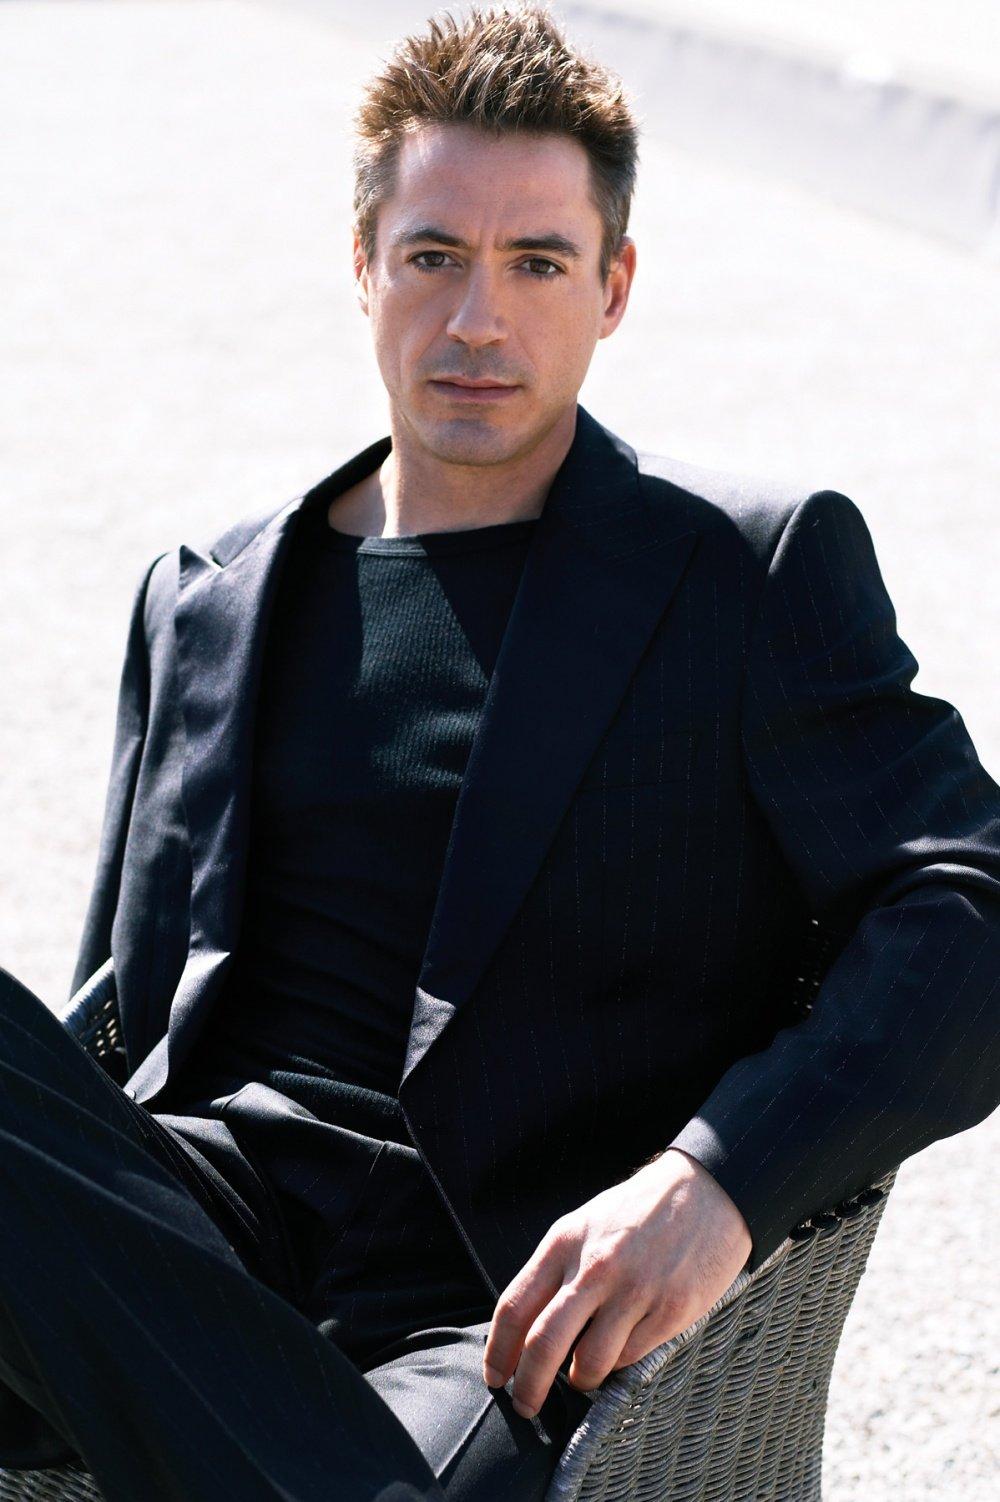 Robert Downey Jr. Pictures | MetroLyrics Robert Downey